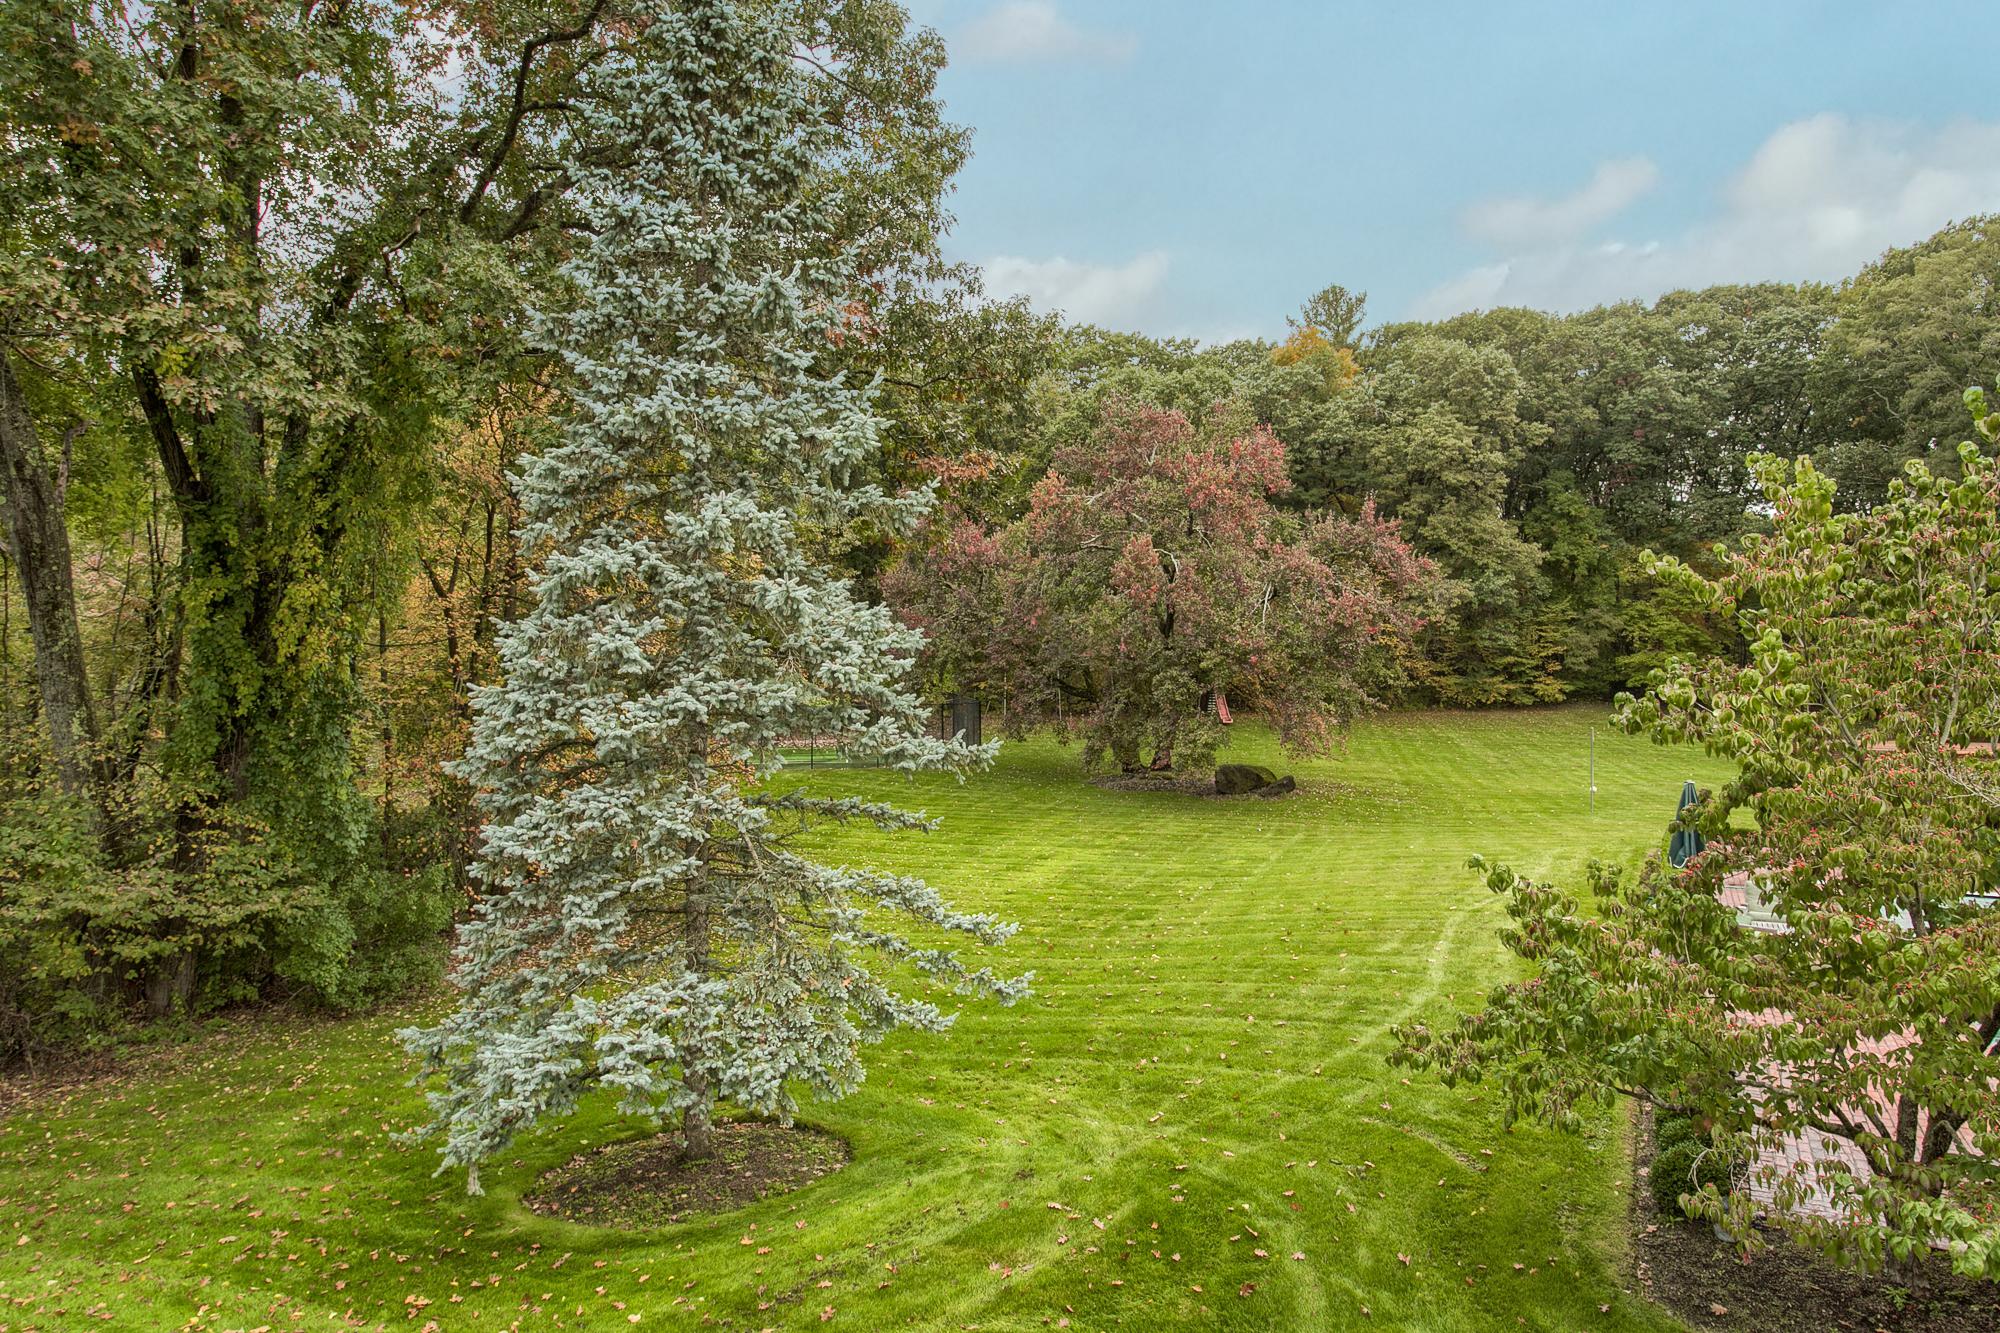 3 Crowell Farm Road, Concord, MA_228-HDR(3).jpg